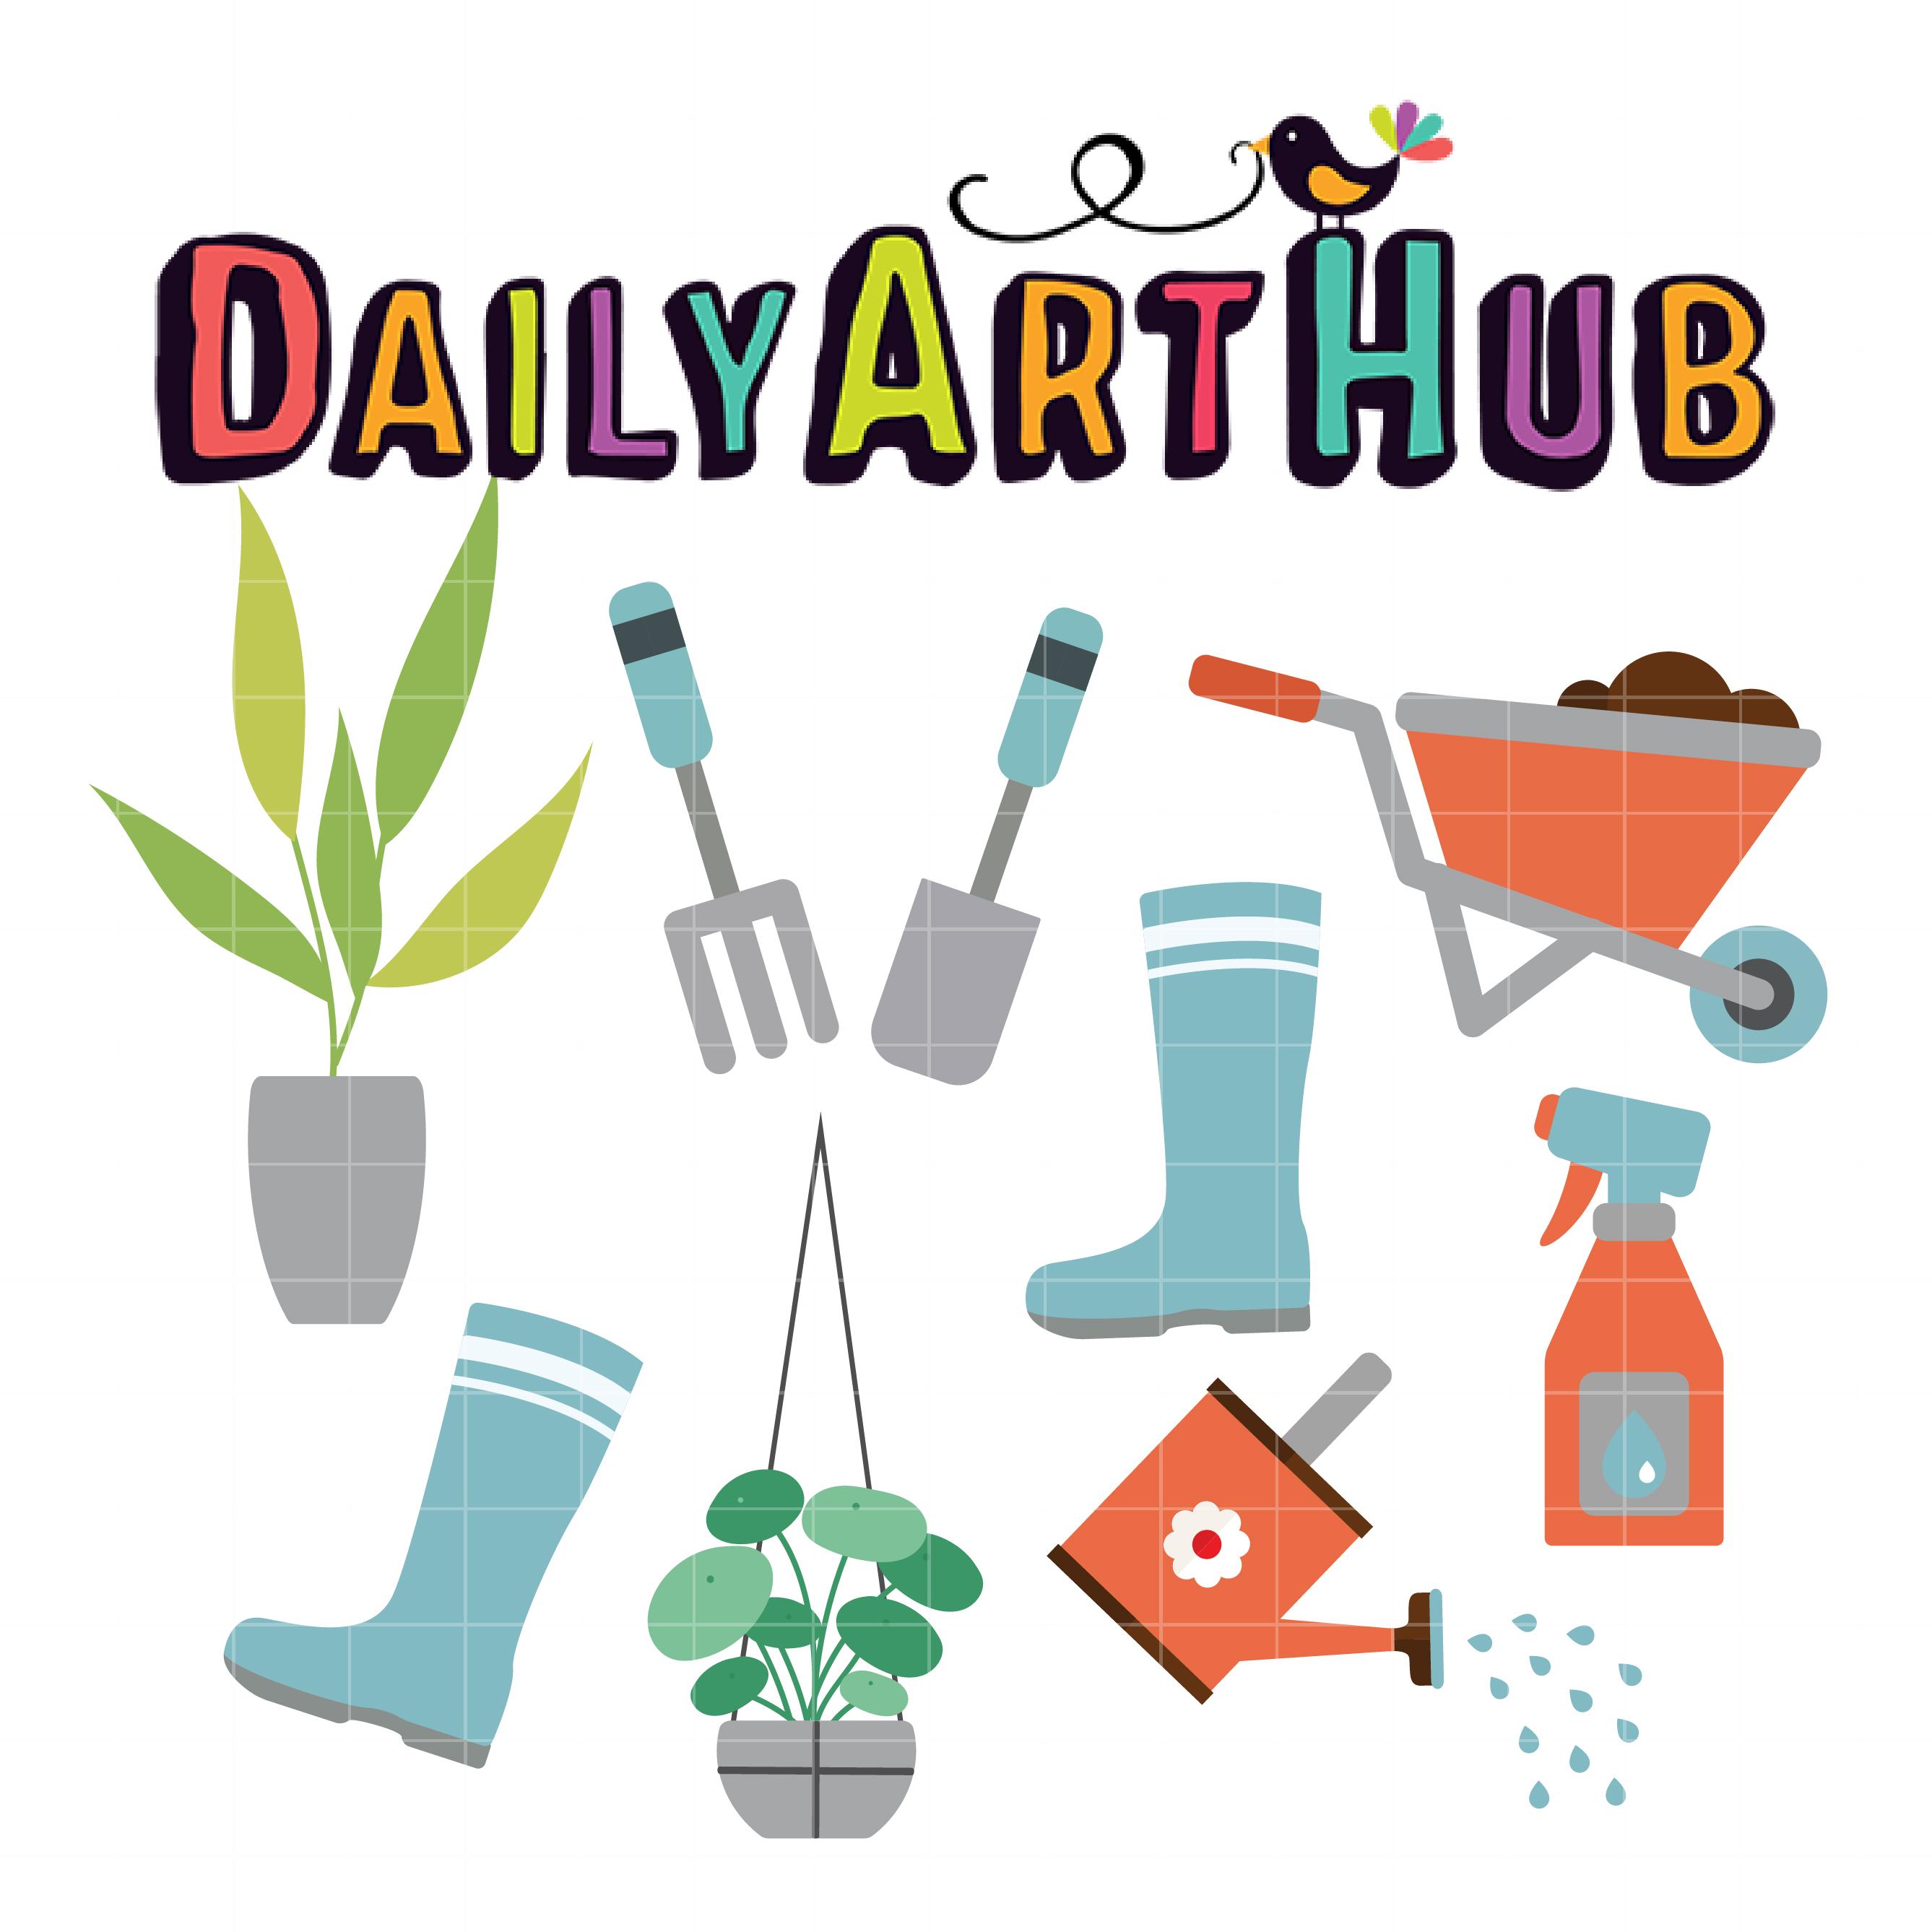 Gardening Tools Clip Art Set Daily Art Hub Free Clip Art Everyday